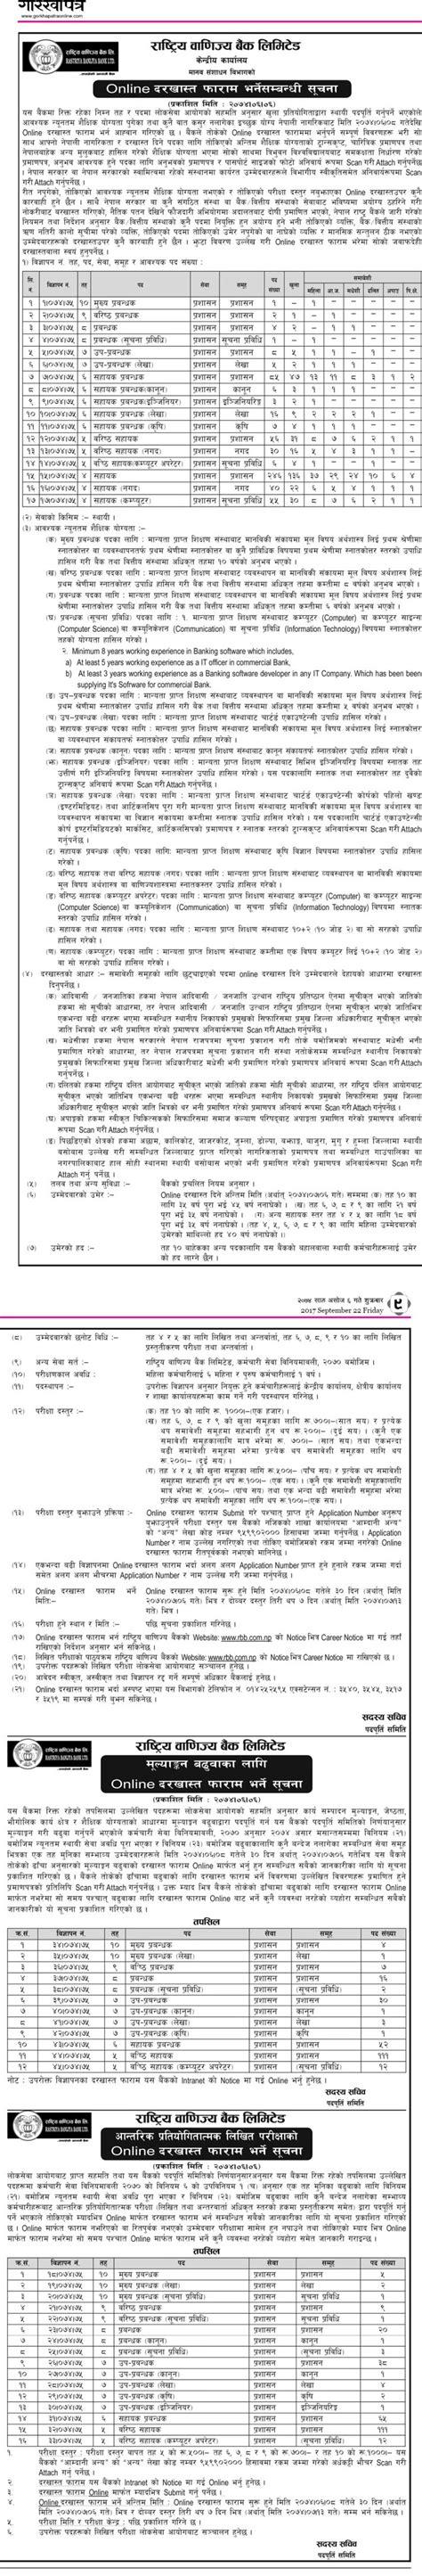 nepal banijya bank vacancy in rastriya banijya bank limited